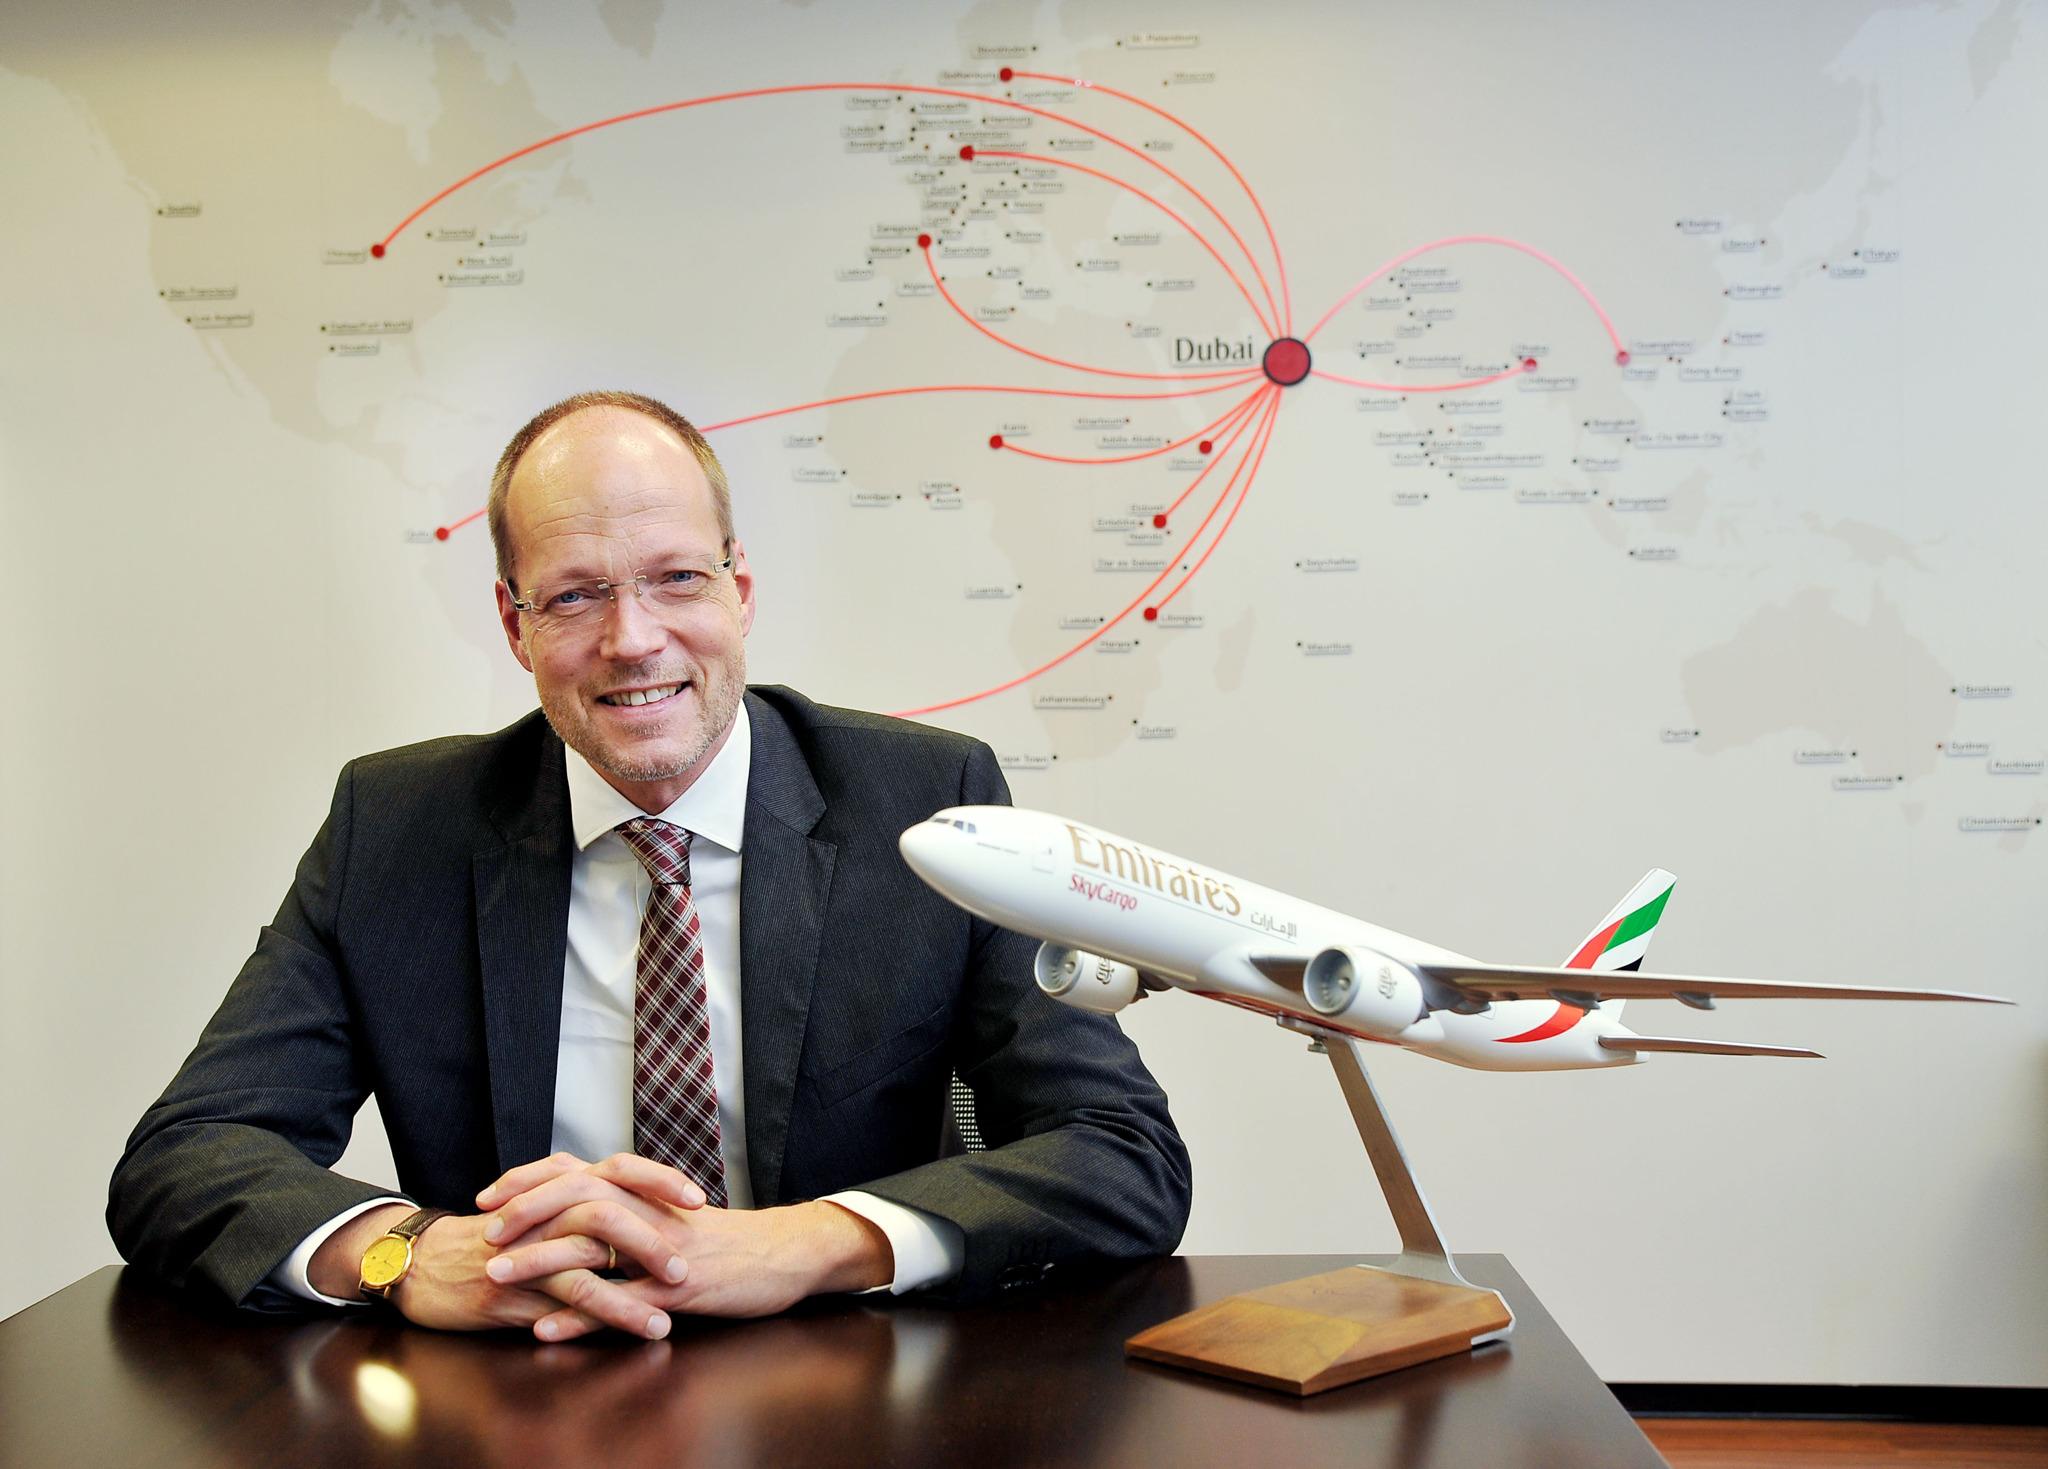 Emirates SkyCargo Appoints New Senior Vice President for